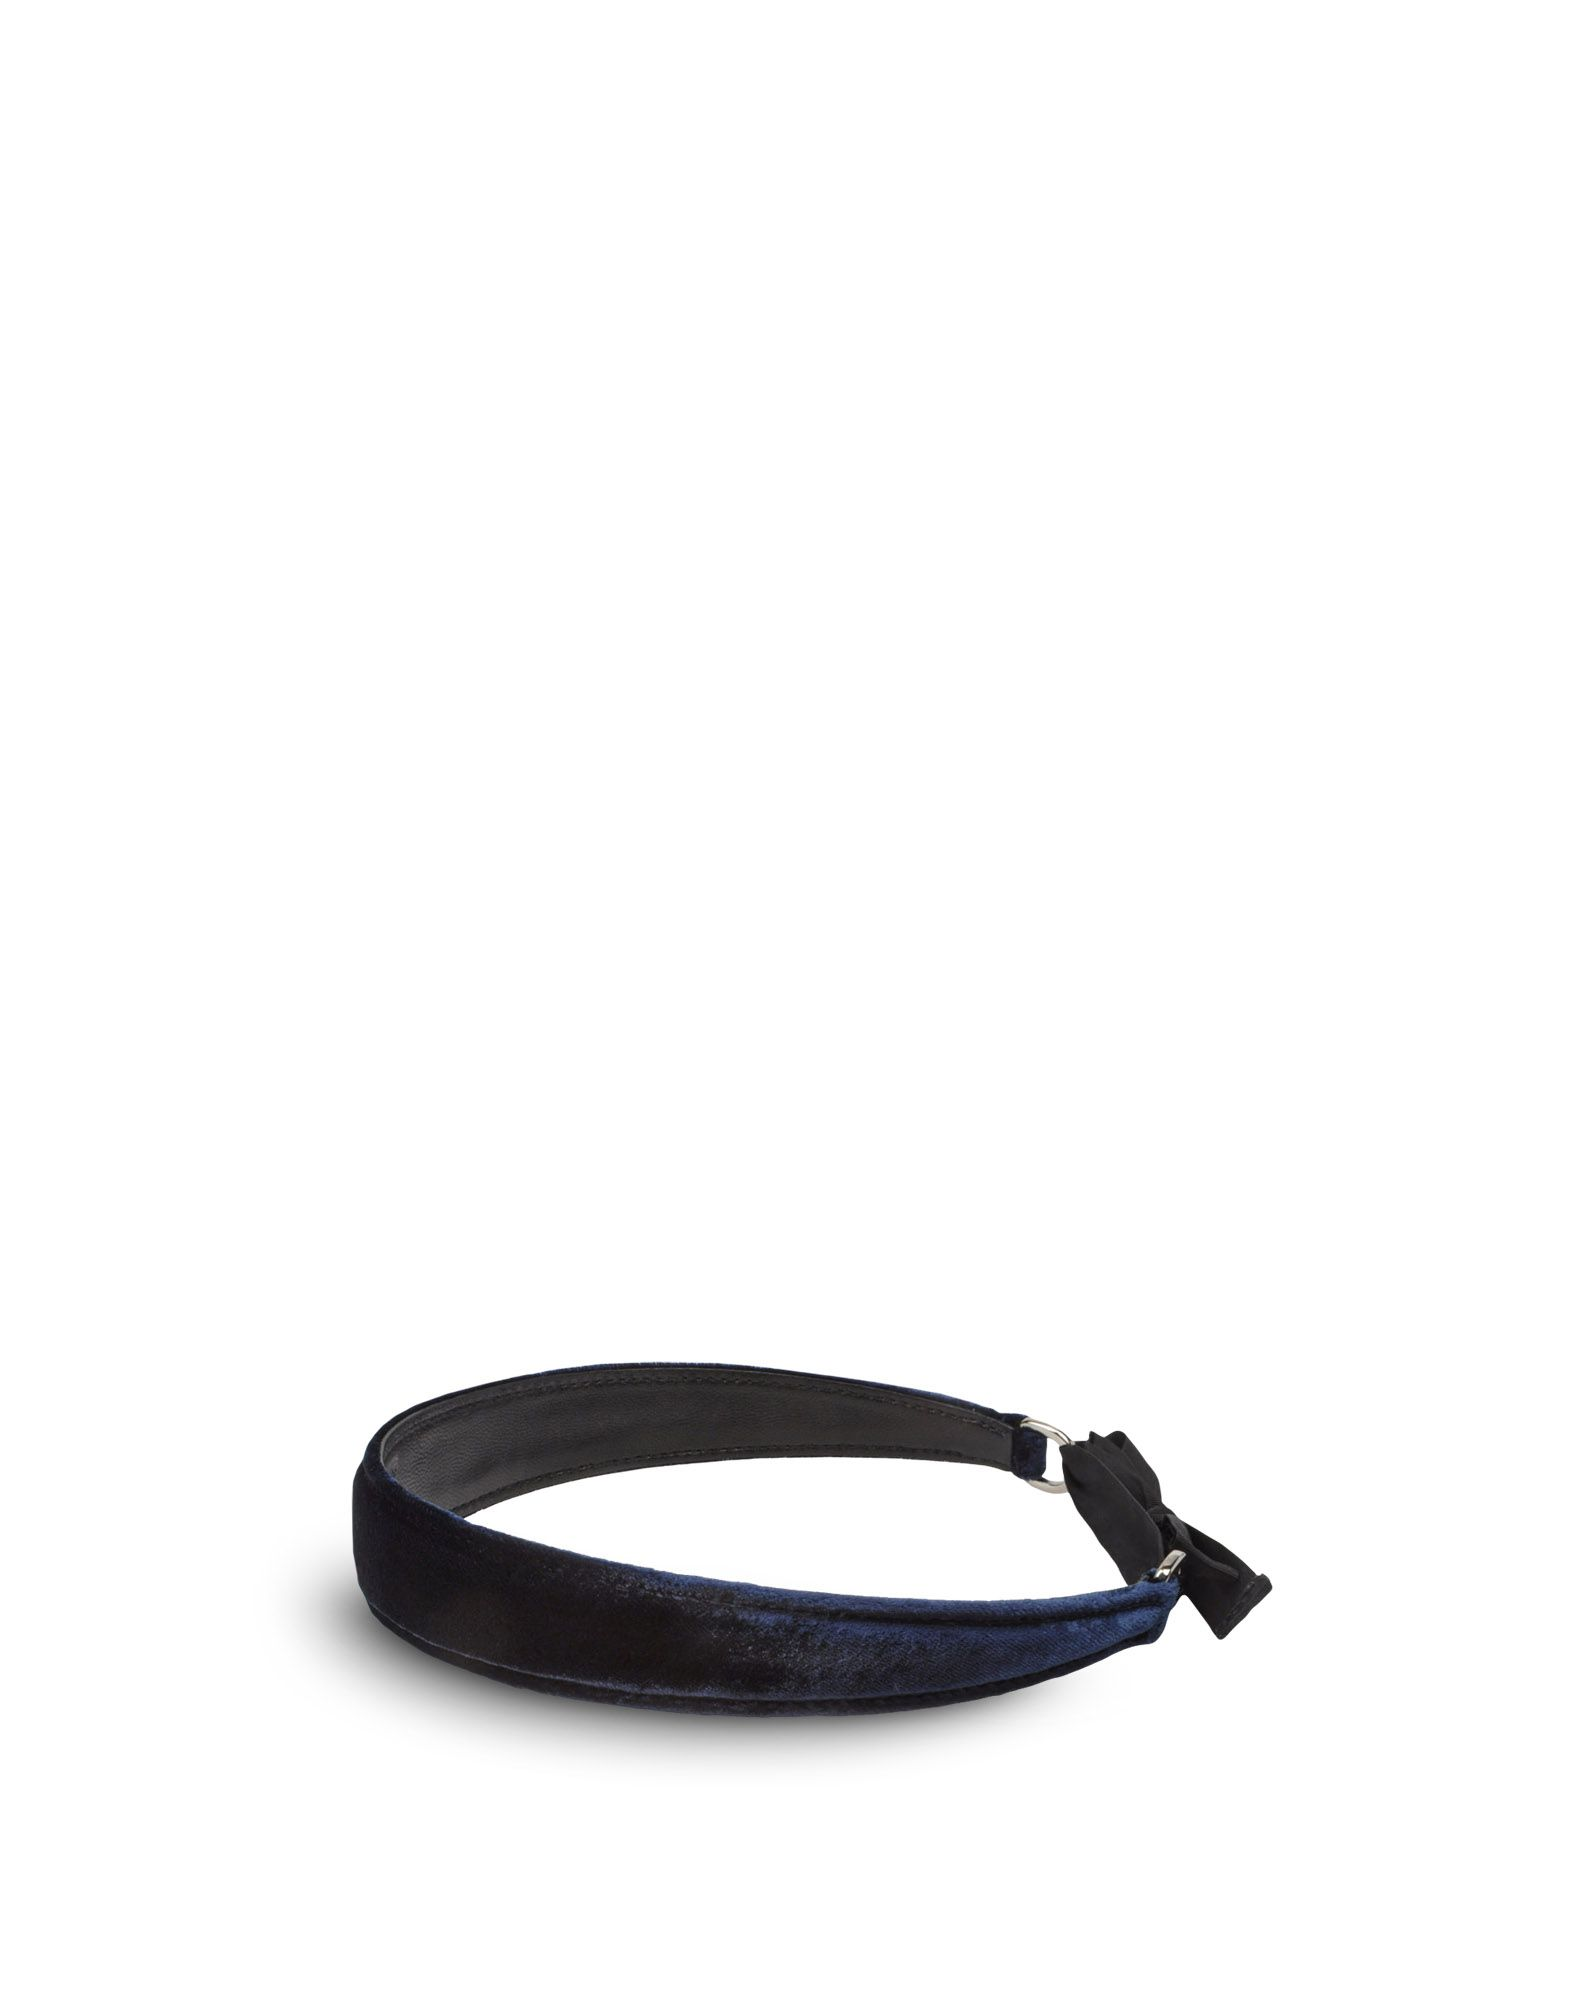 Circlet - JIL SANDER NAVY Online Store